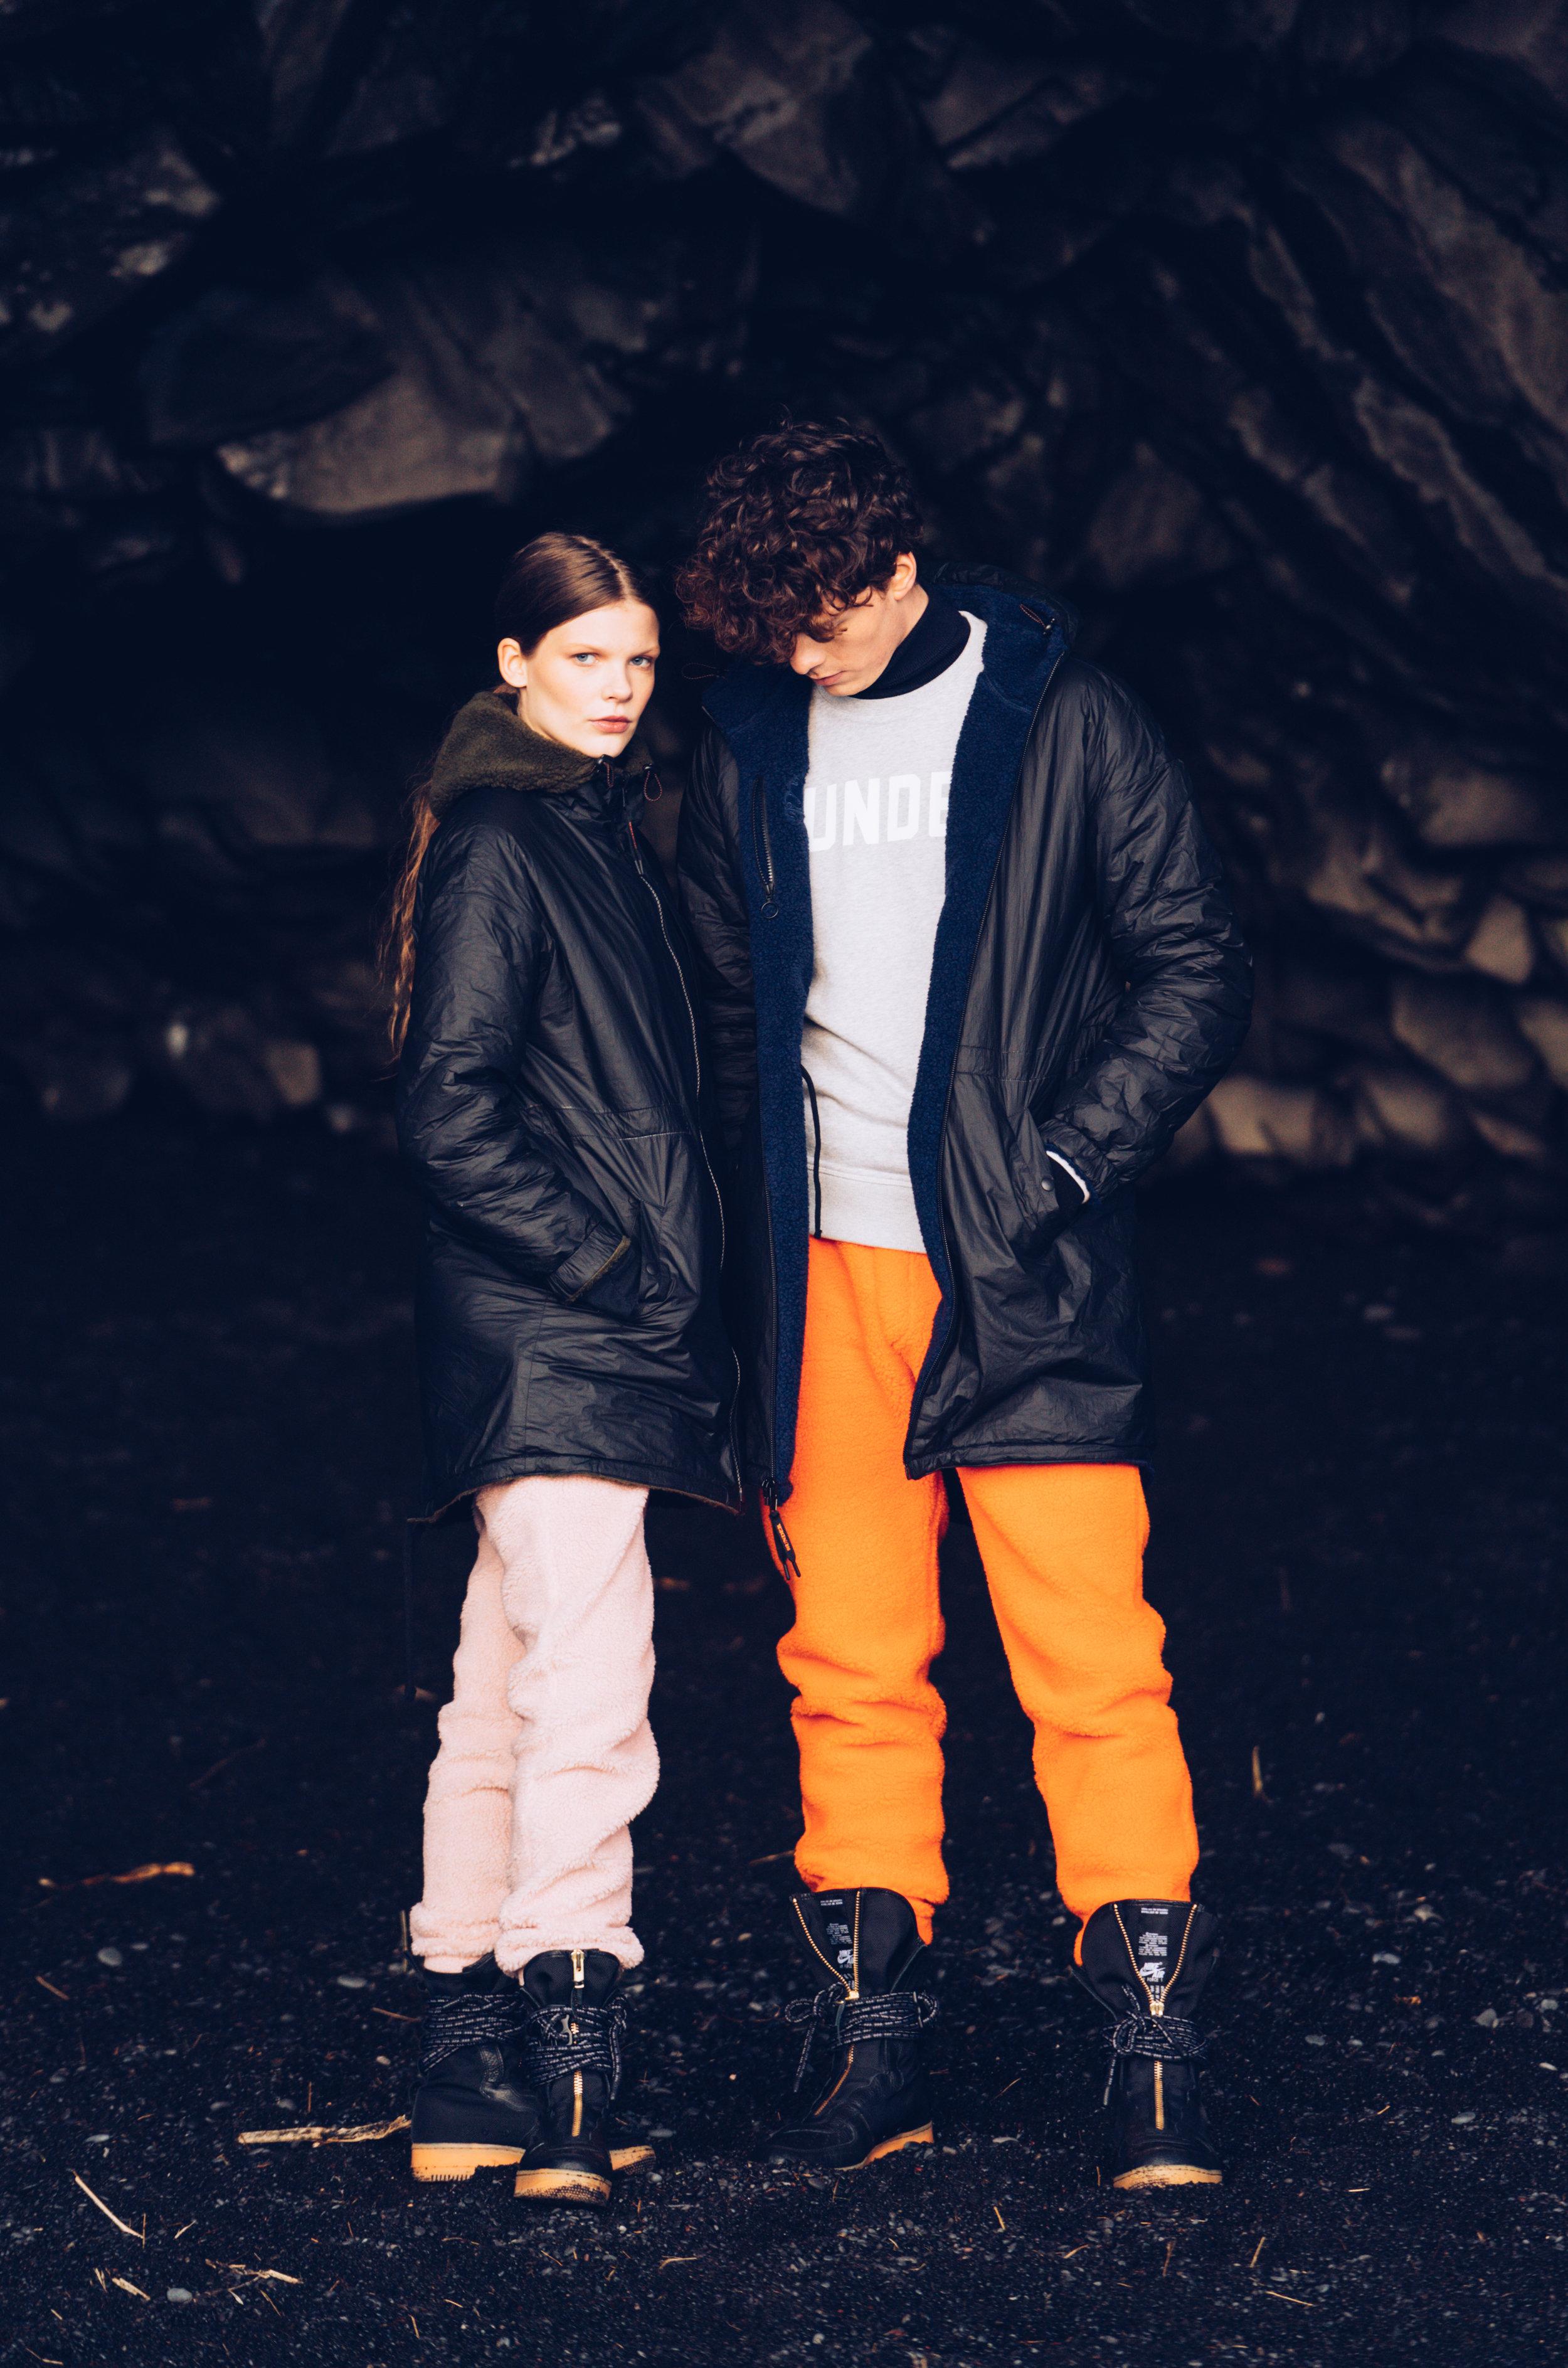 Sundek photoshoot Kristín and Sólon in a cave wearing reversed jackets